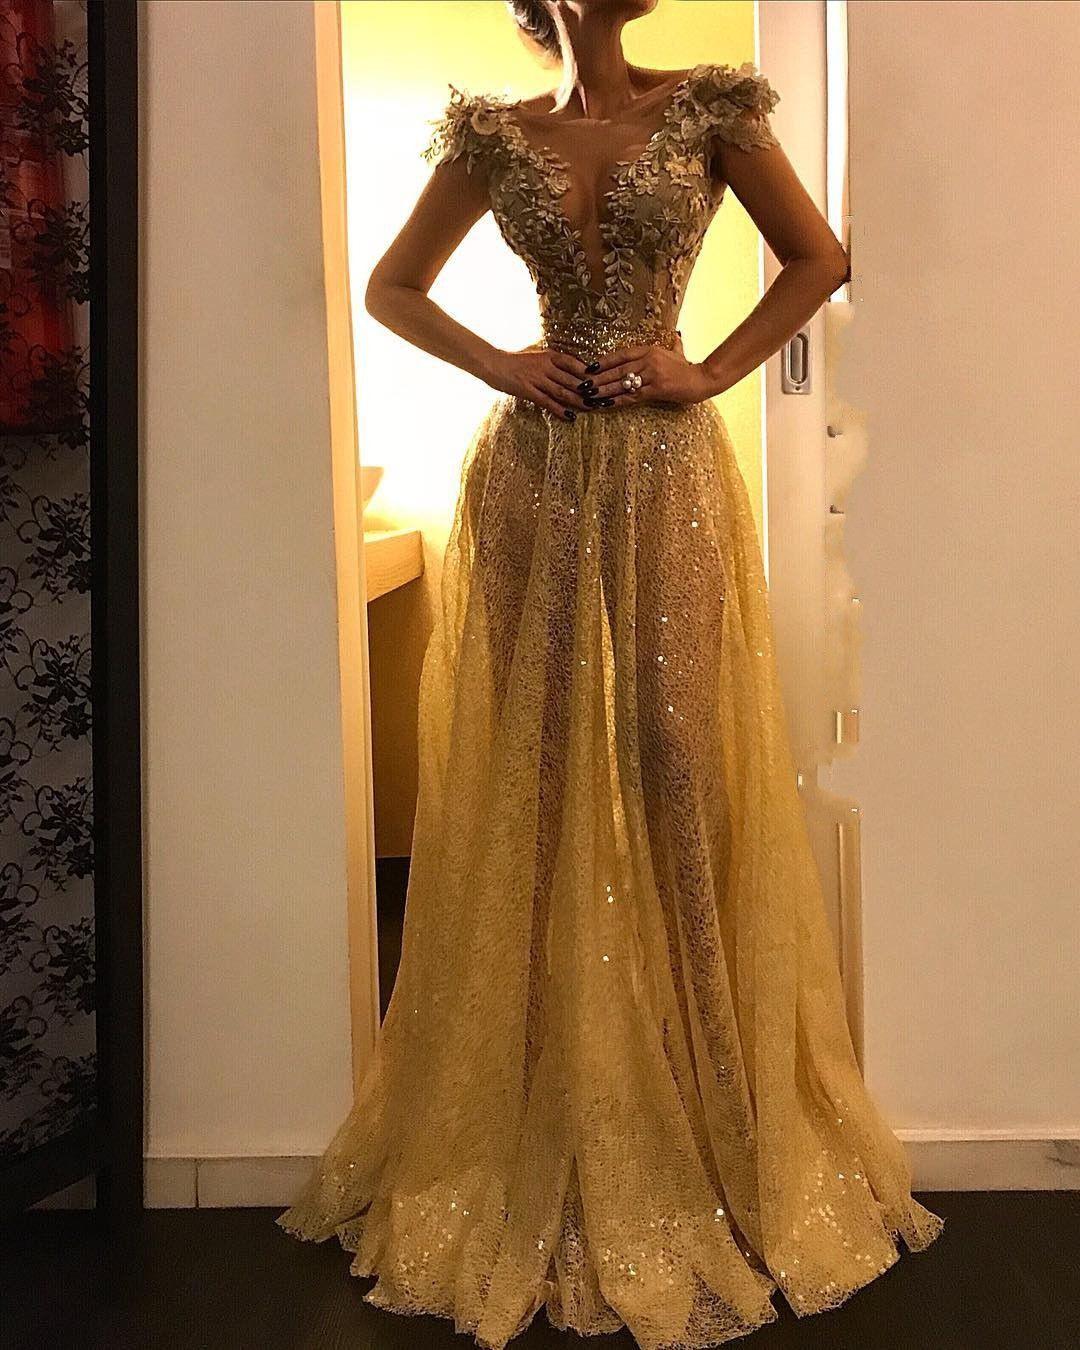 Designer Genial Goldenes Abendkleid SpezialgebietFormal Wunderbar Goldenes Abendkleid Stylish